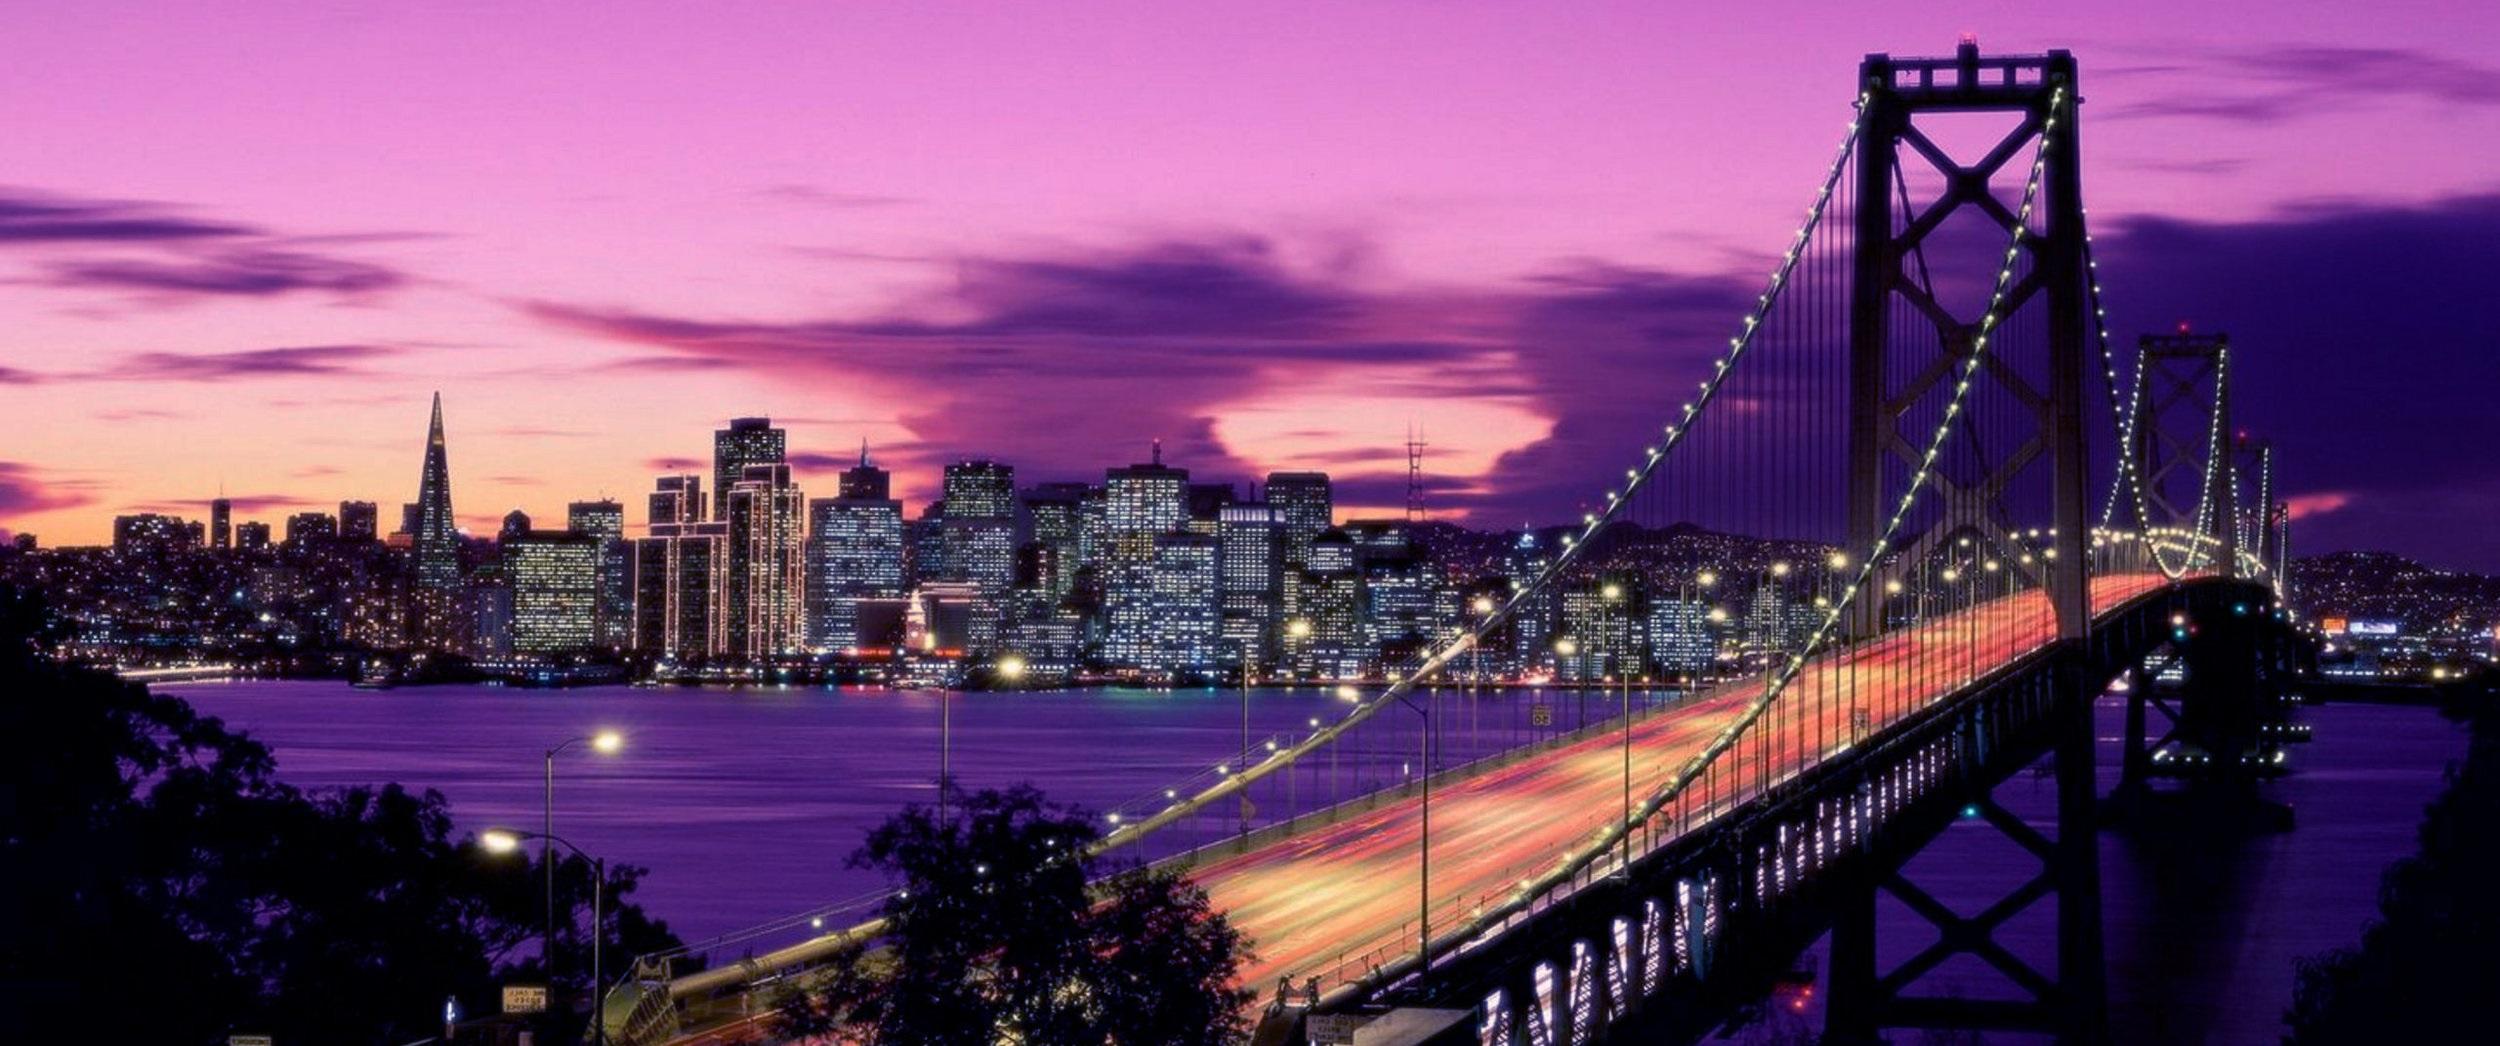 San-Francisco-Wallpaper-26.jpg